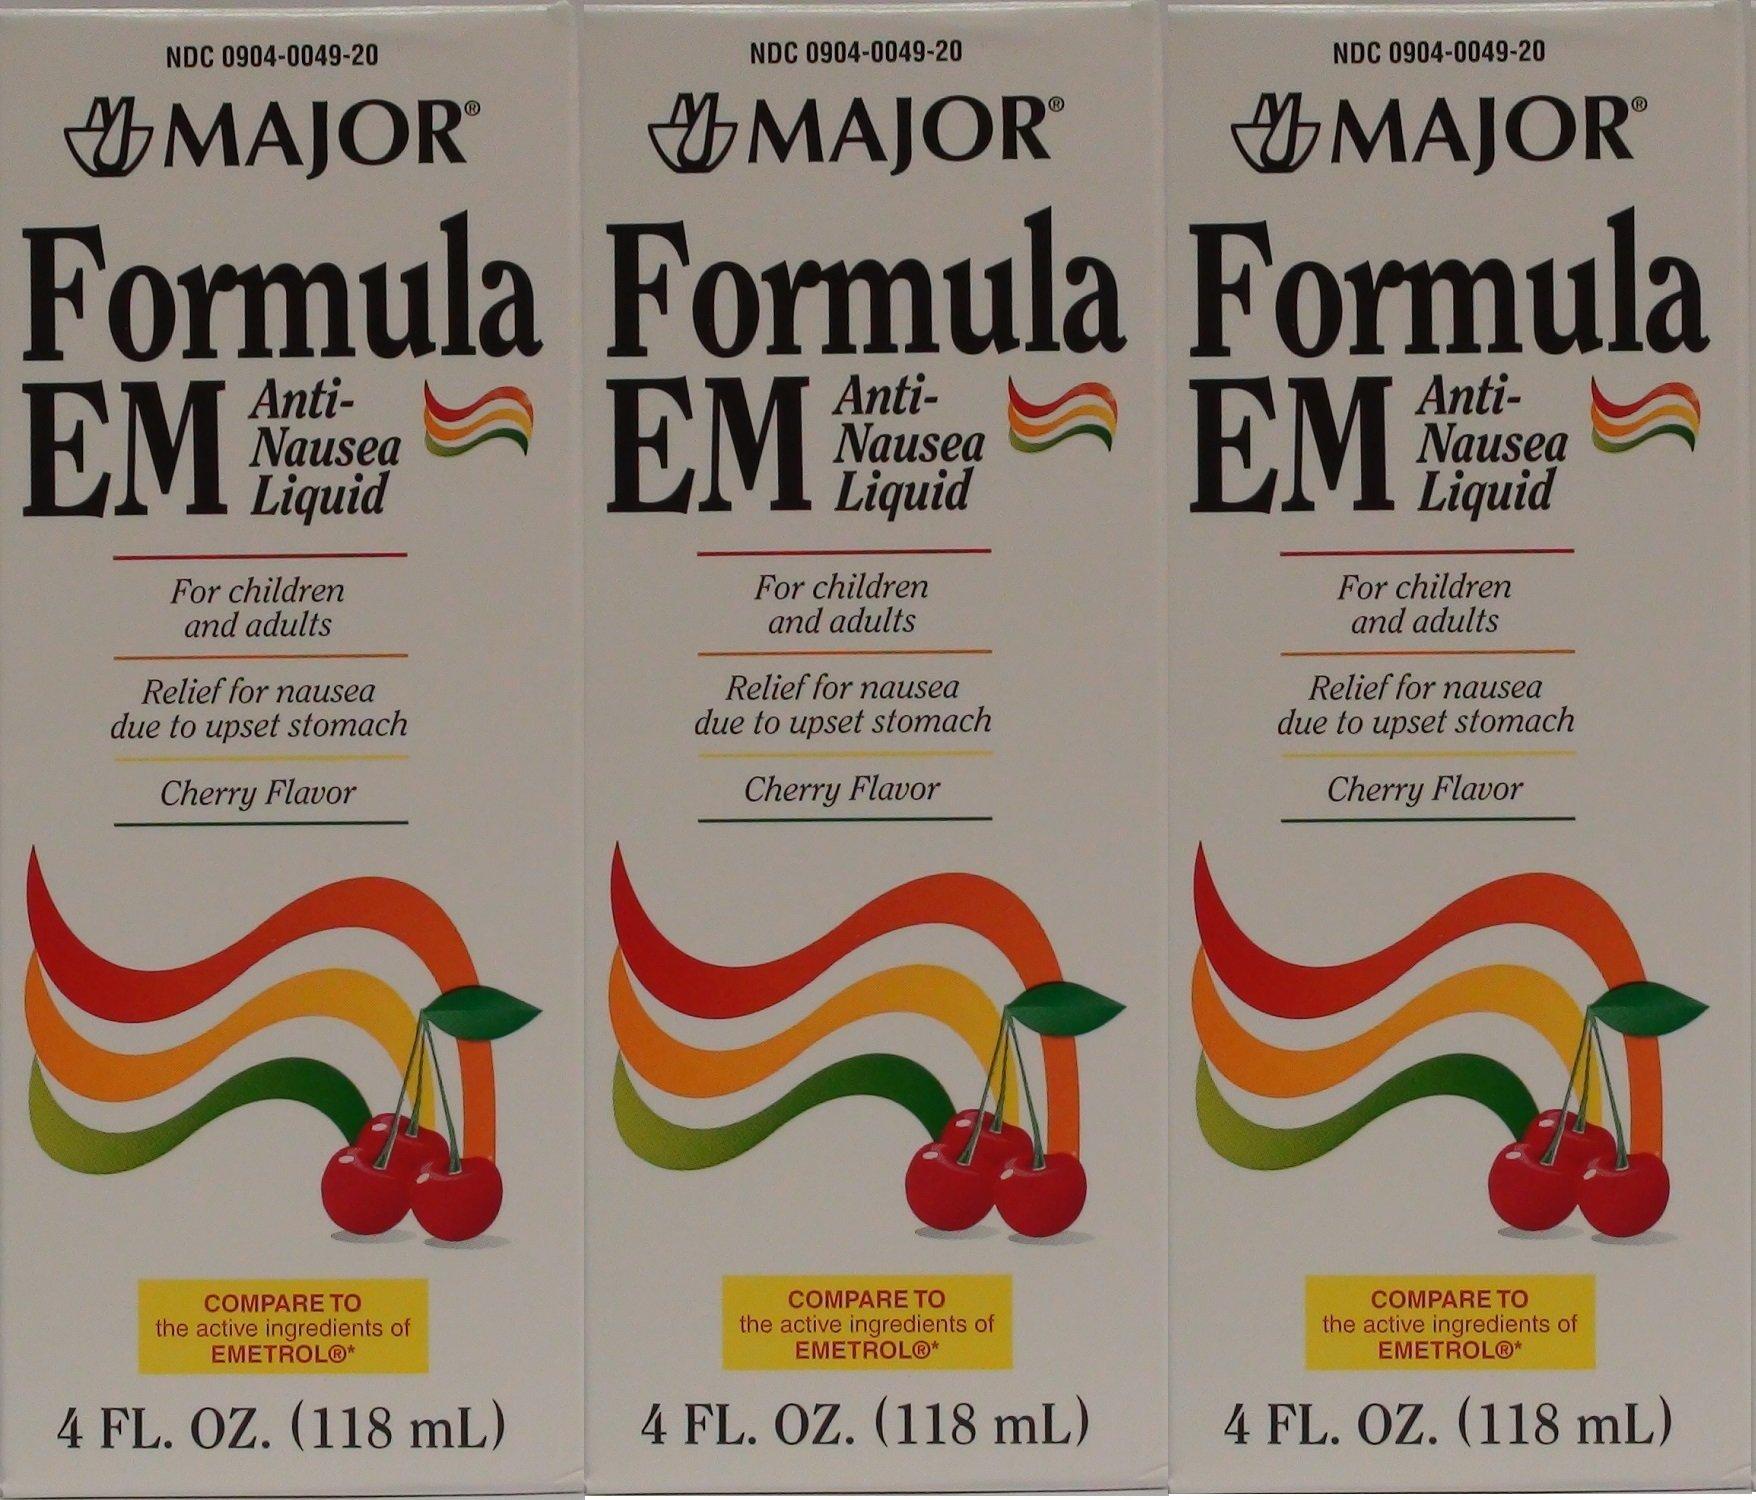 Formula EM Generic for Emetrol Nausea & Upset Stomach Relief Cherry Flavor 4 oz. Bottle Pack of 3 Total 12 oz.